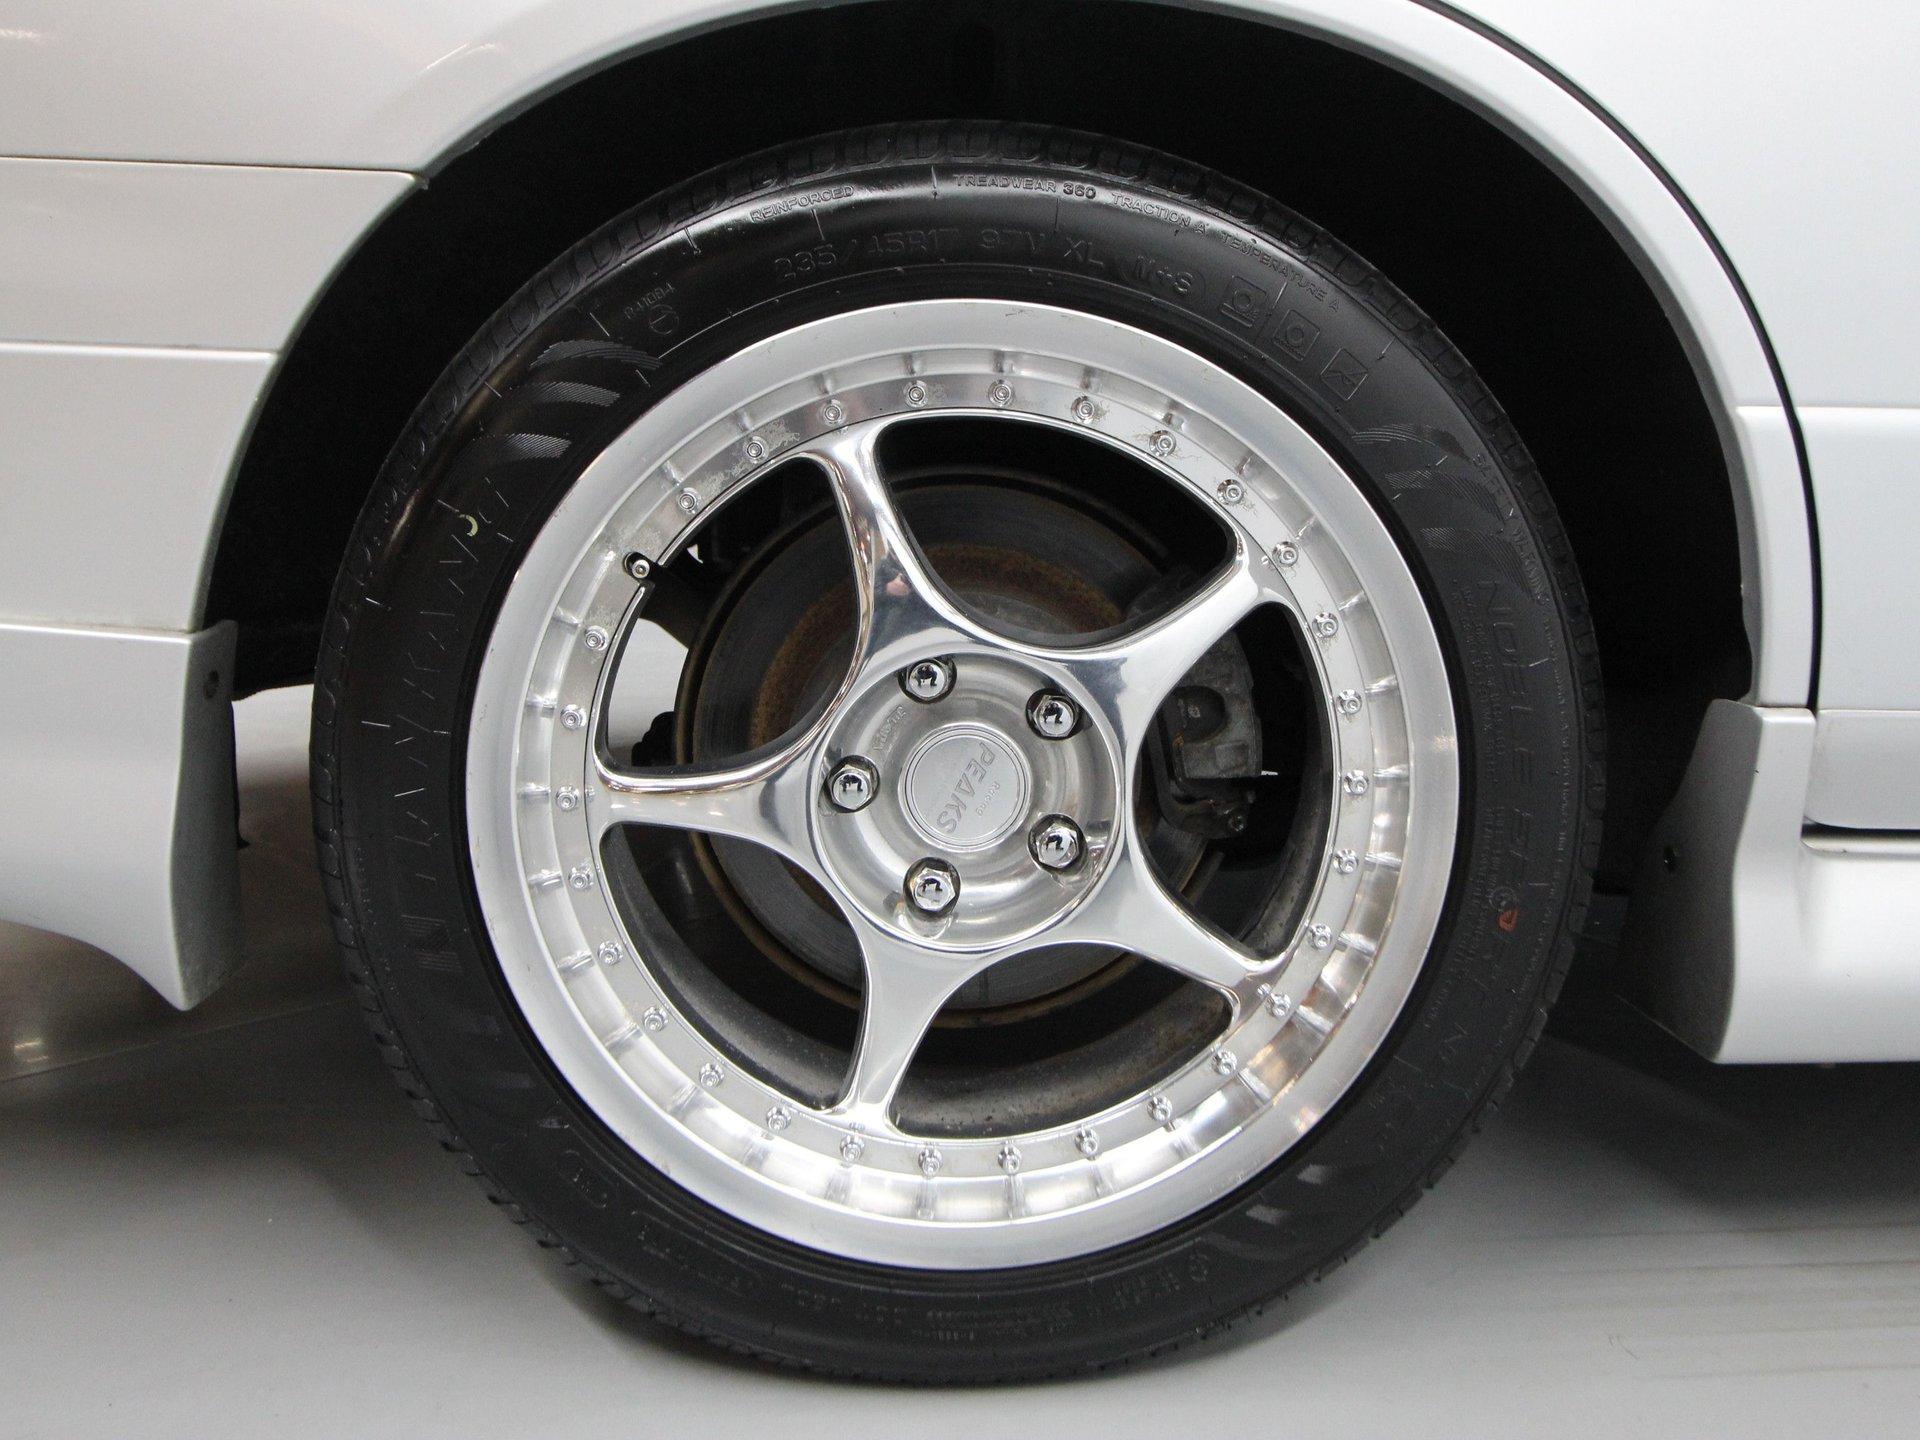 1995 Nissan Gloria